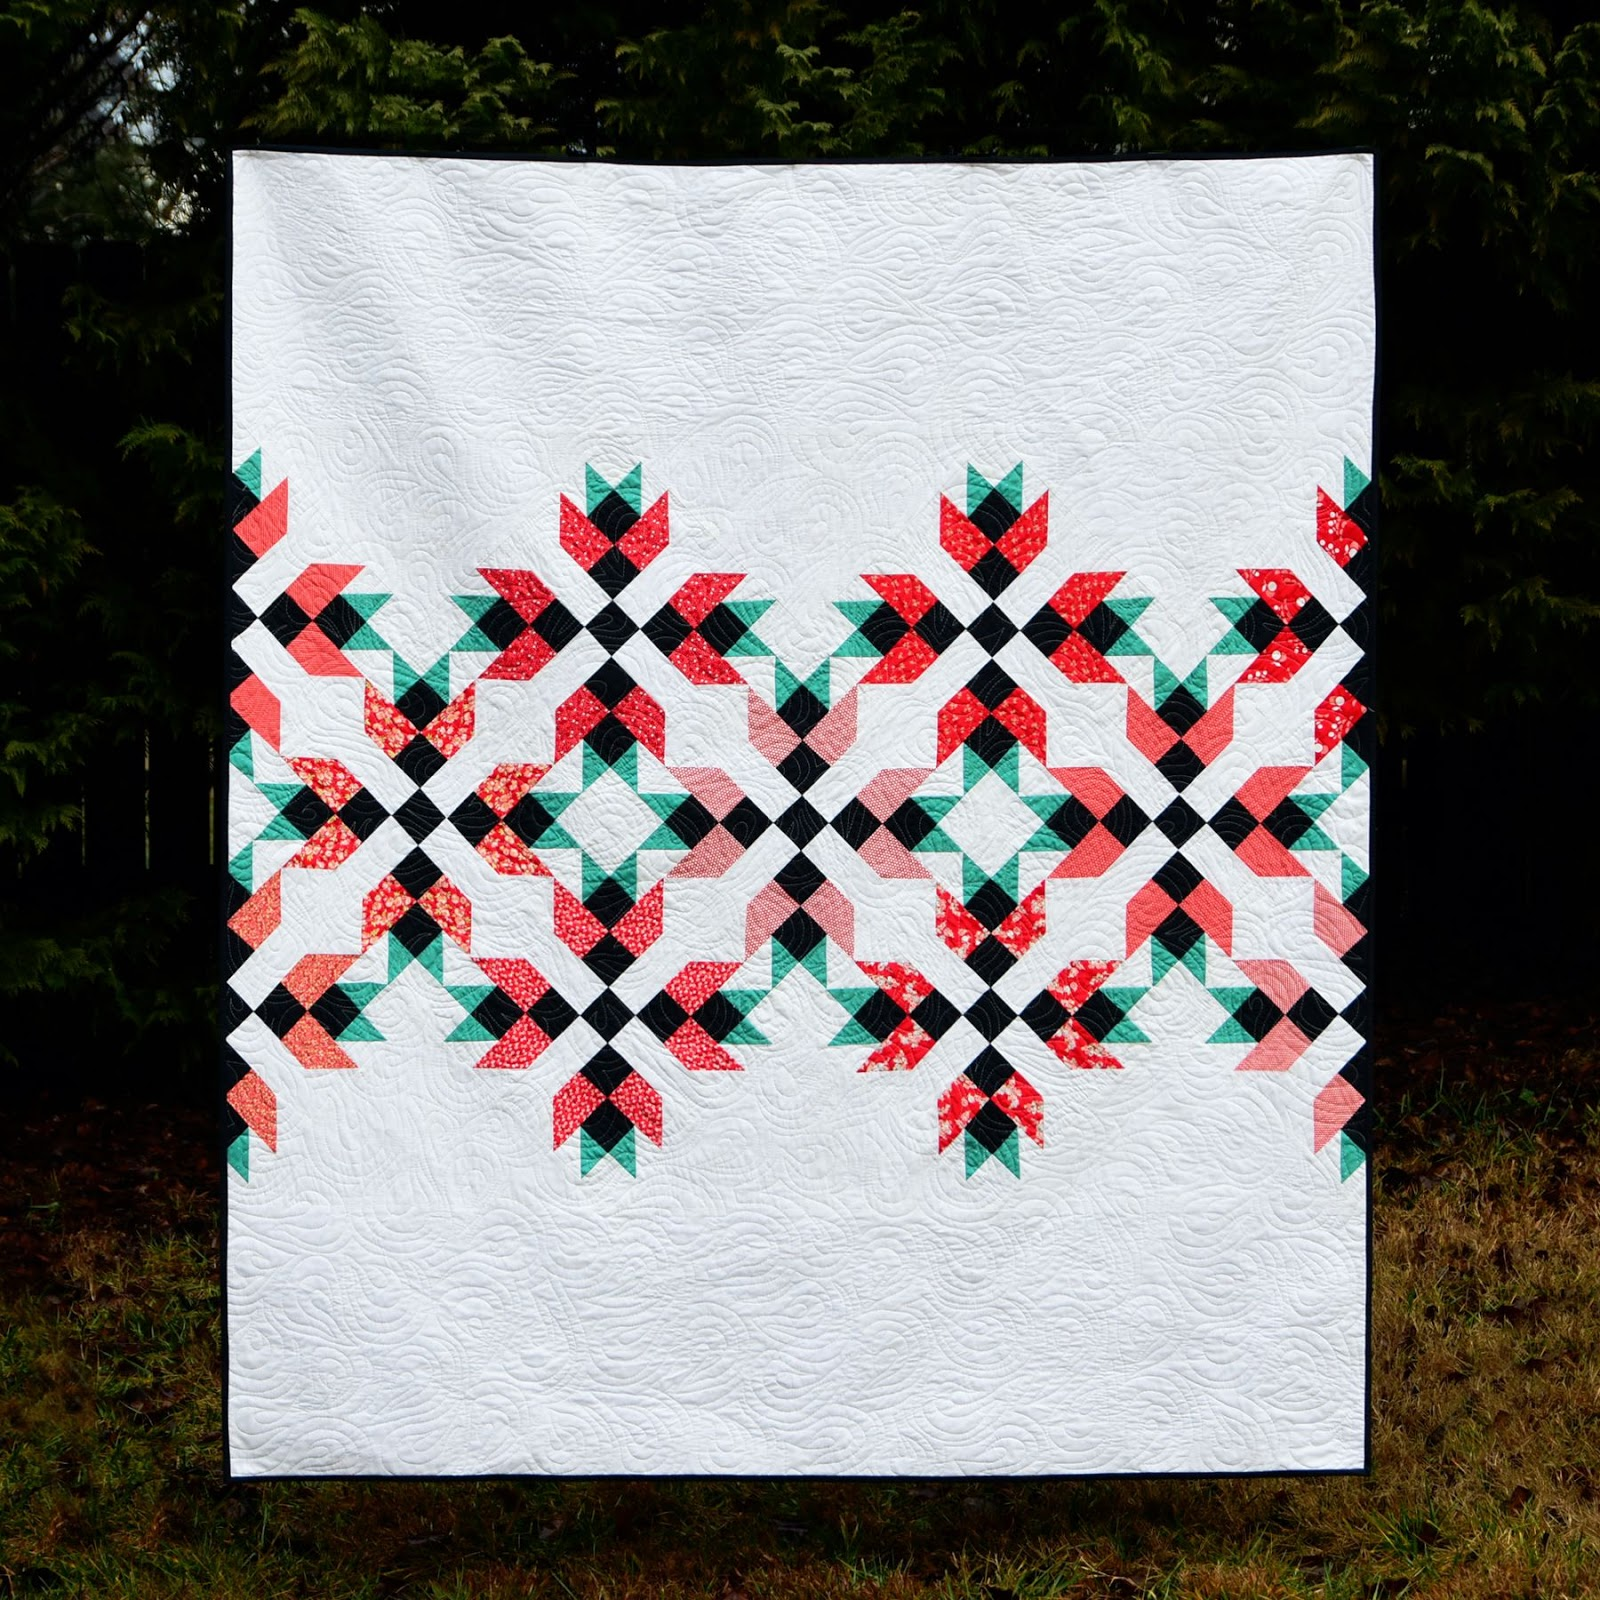 Meadow Mist Designs: Magnolia Mystery Quilt ++ My Reveal : magnolia quilt pattern - Adamdwight.com